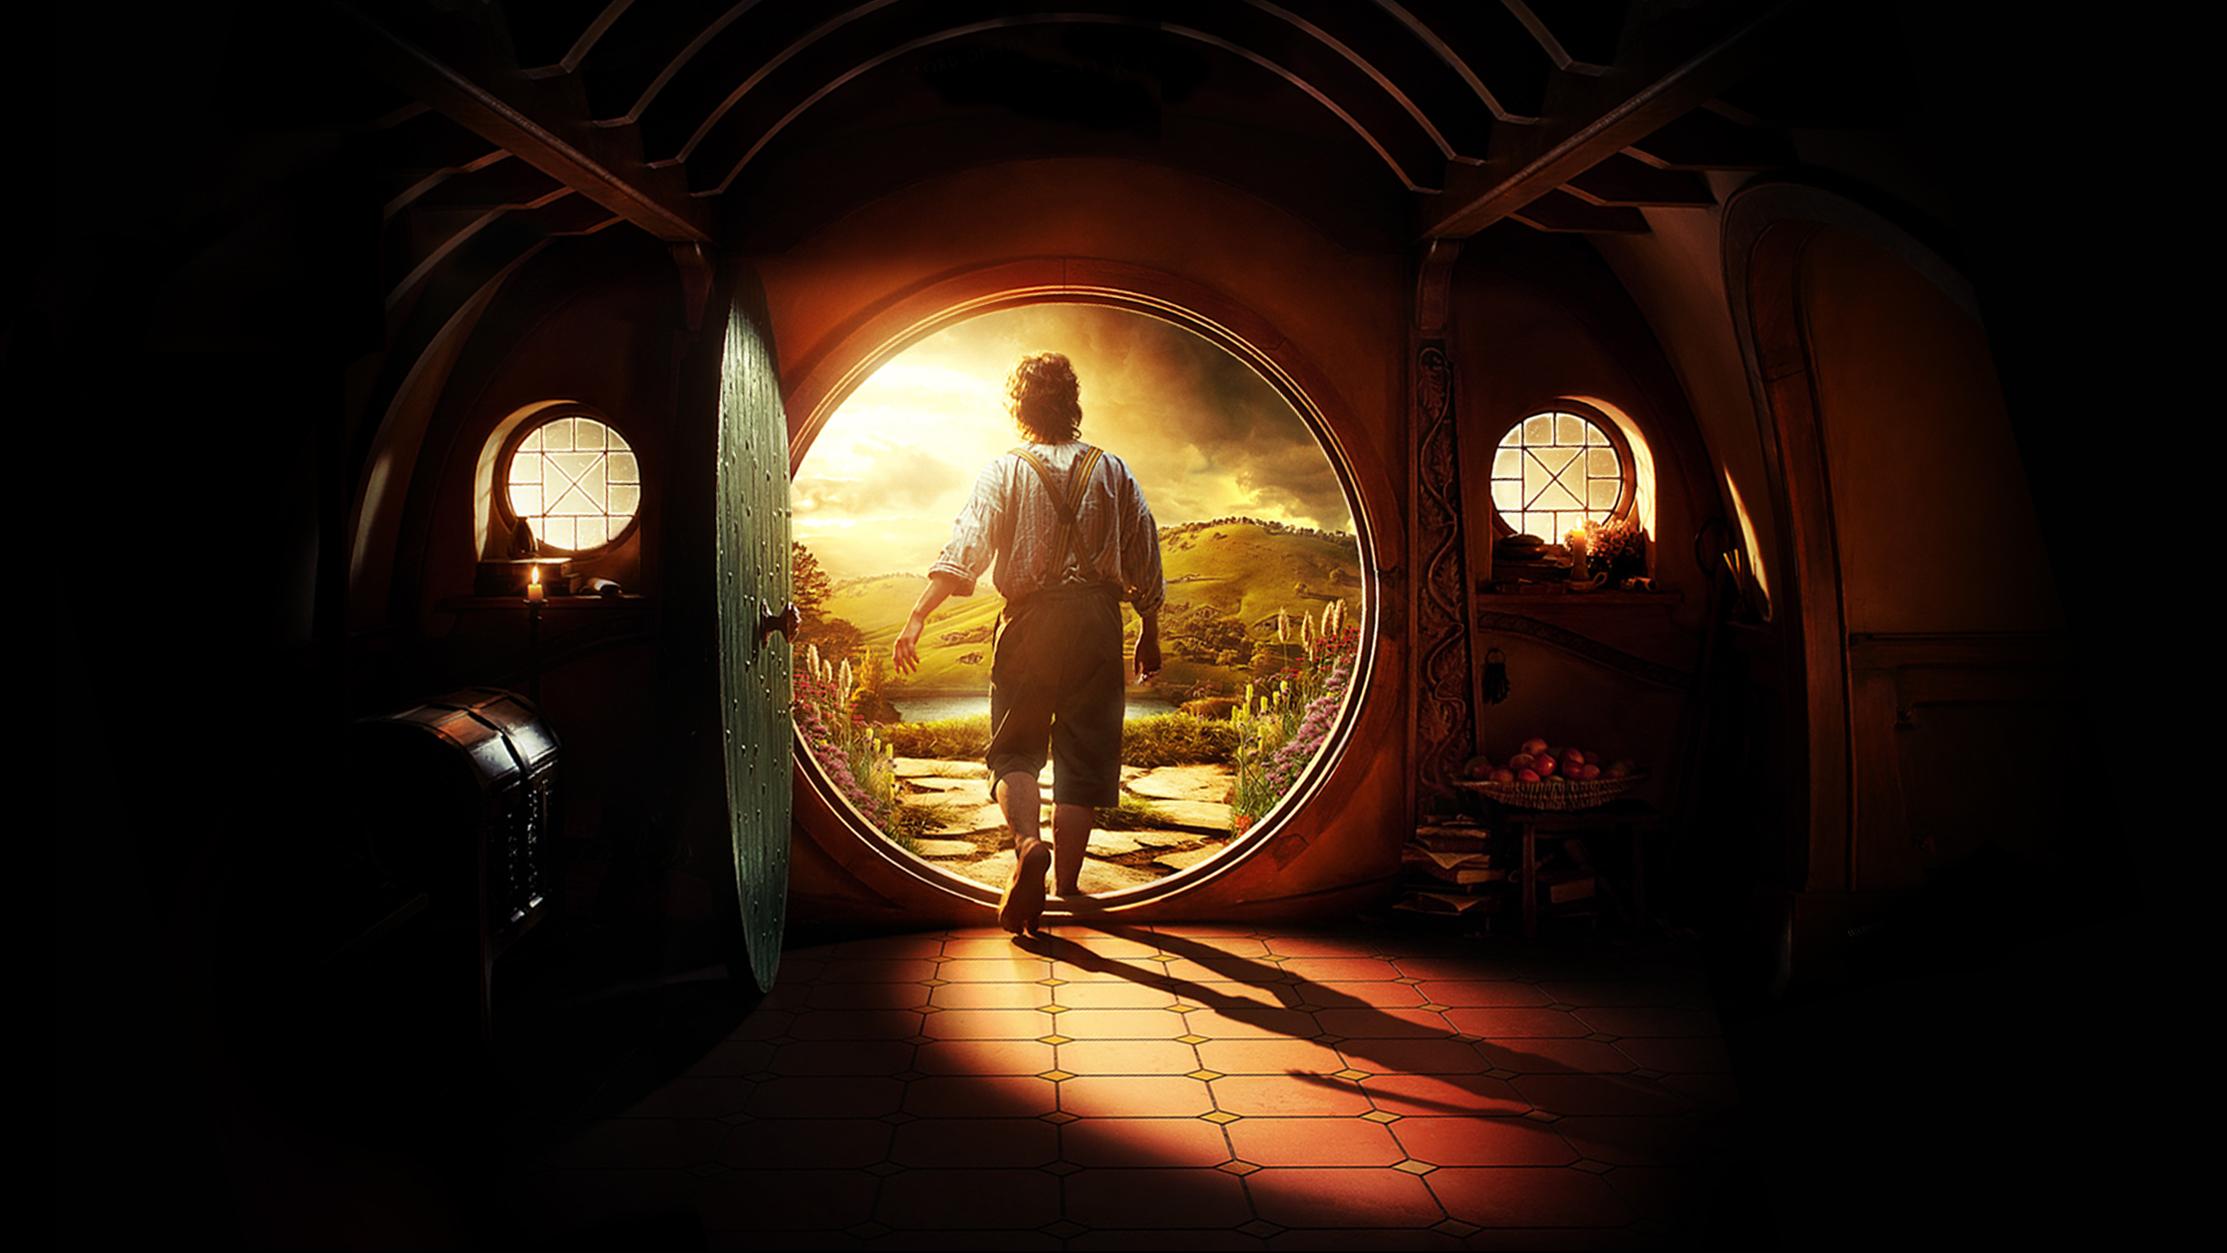 The Hobbit   Bilbo Baggins Wallpaper   The Hobbit Photo 33042280 2227x1253